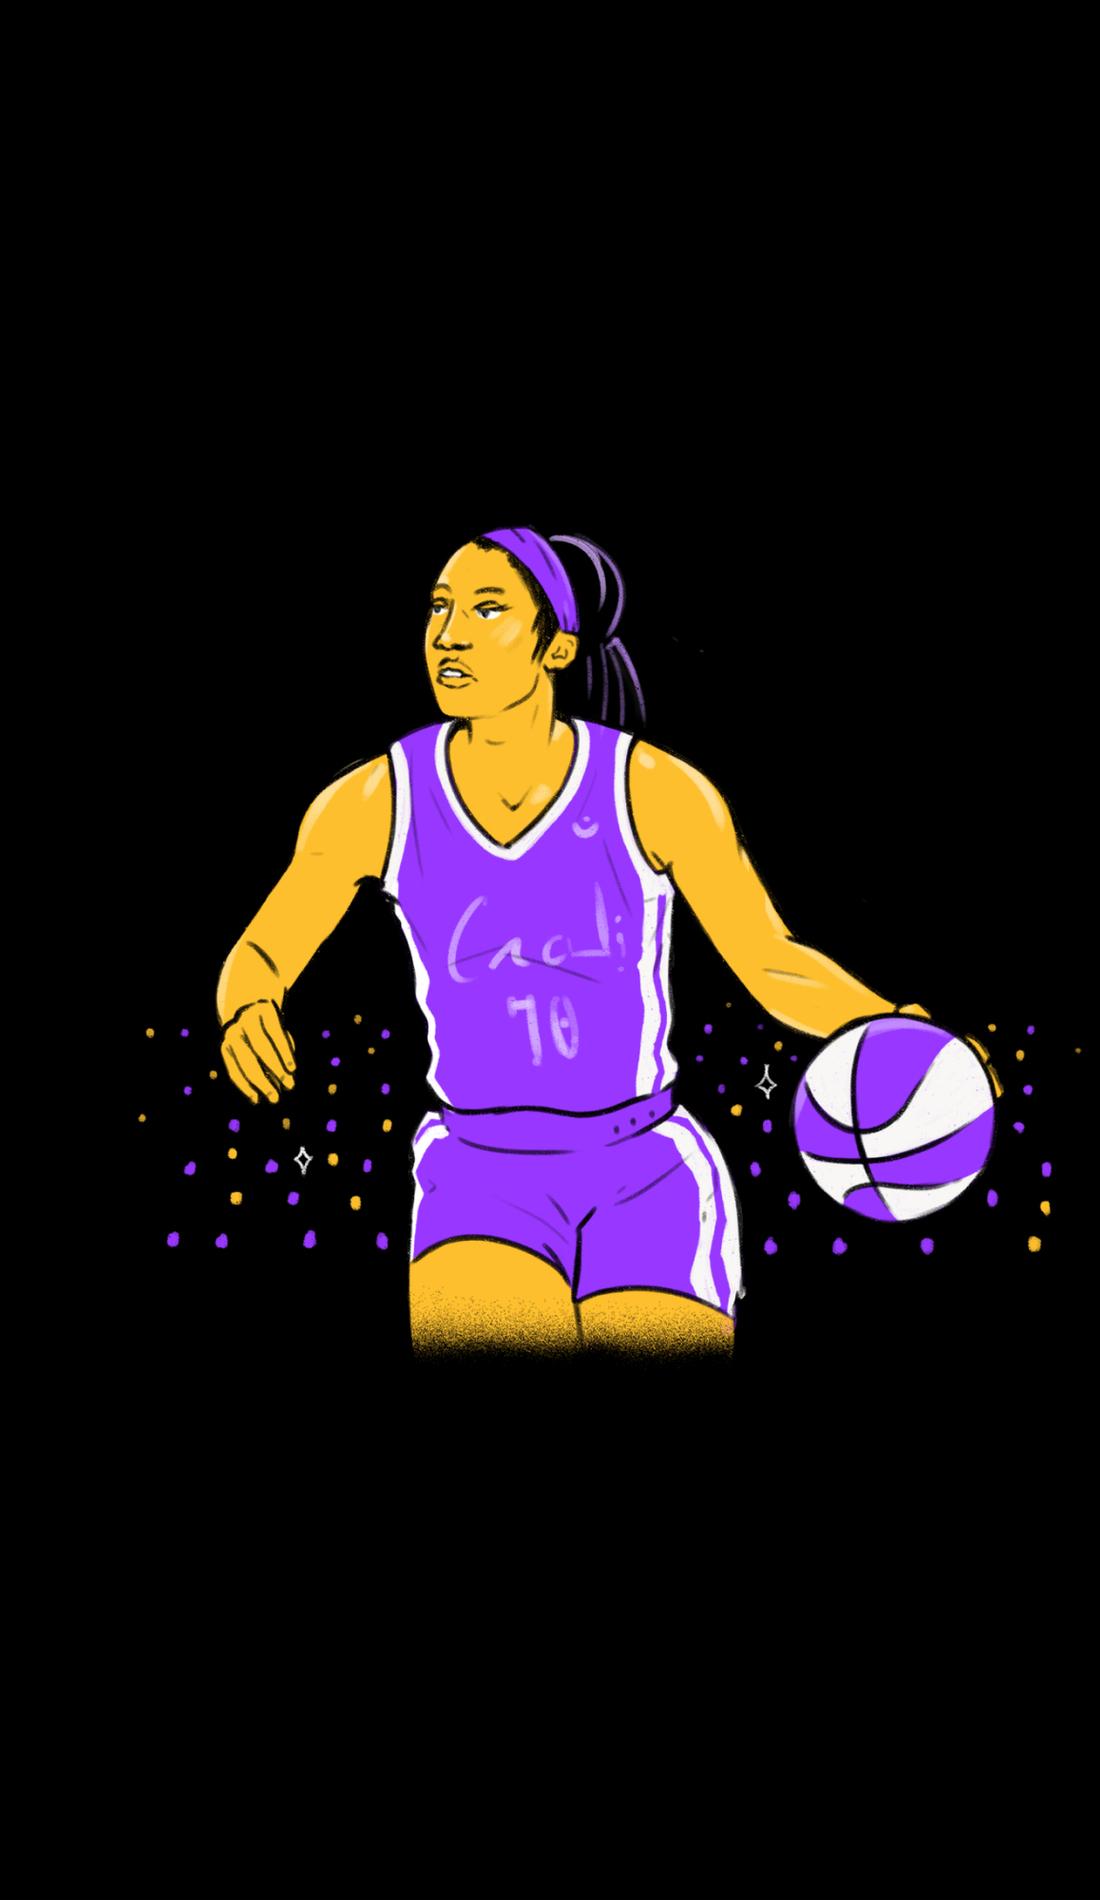 A North Carolina A&T Aggies Womens Basketball live event